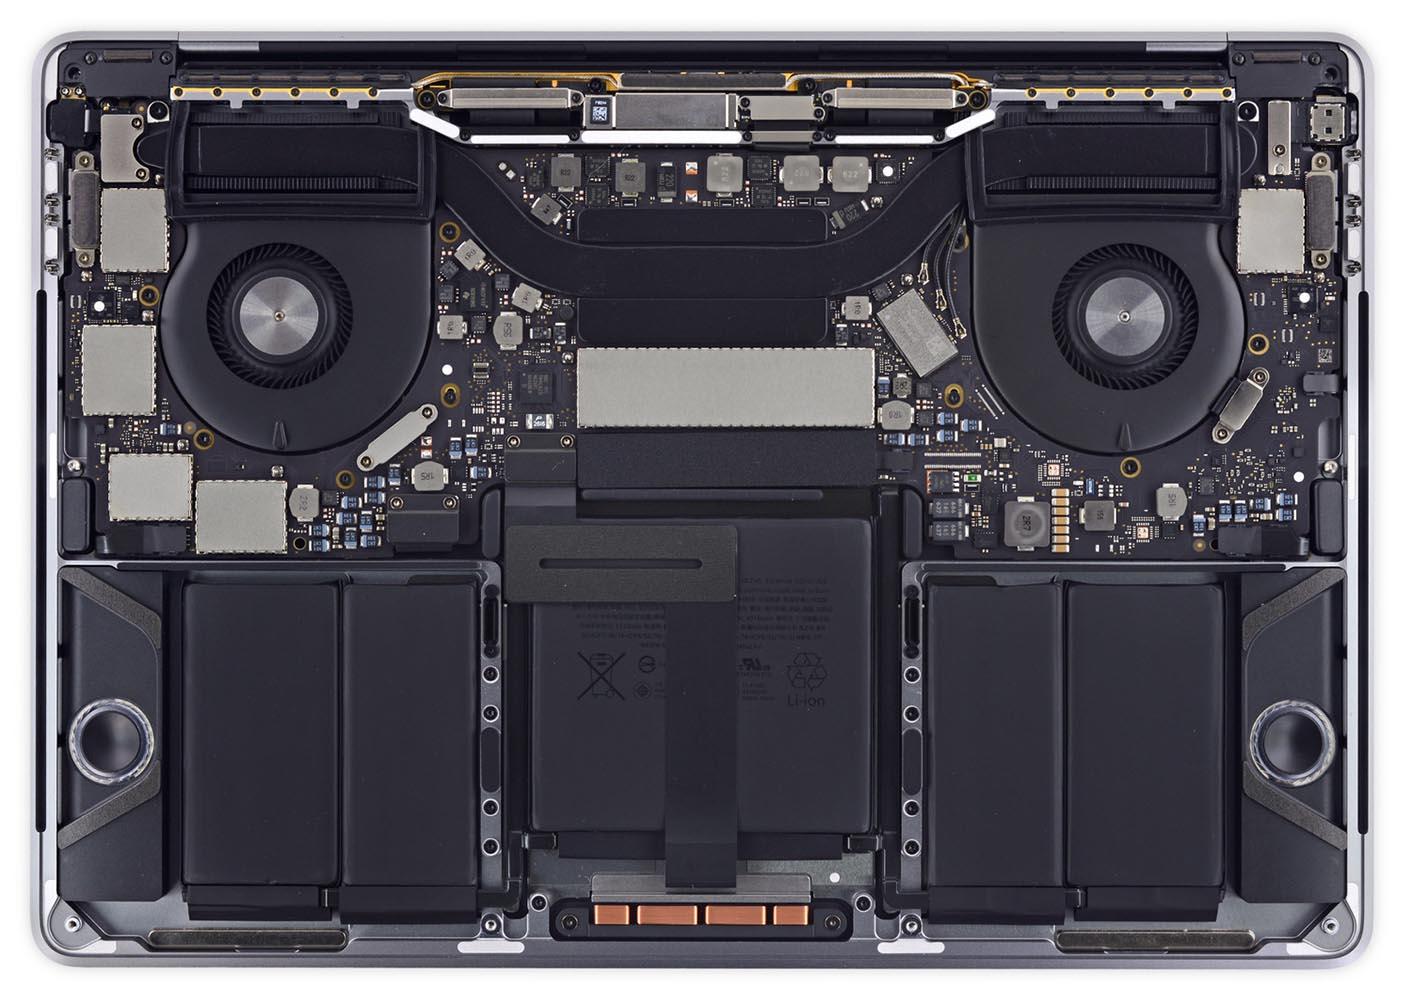 MacBook Pro 2016 iFixit